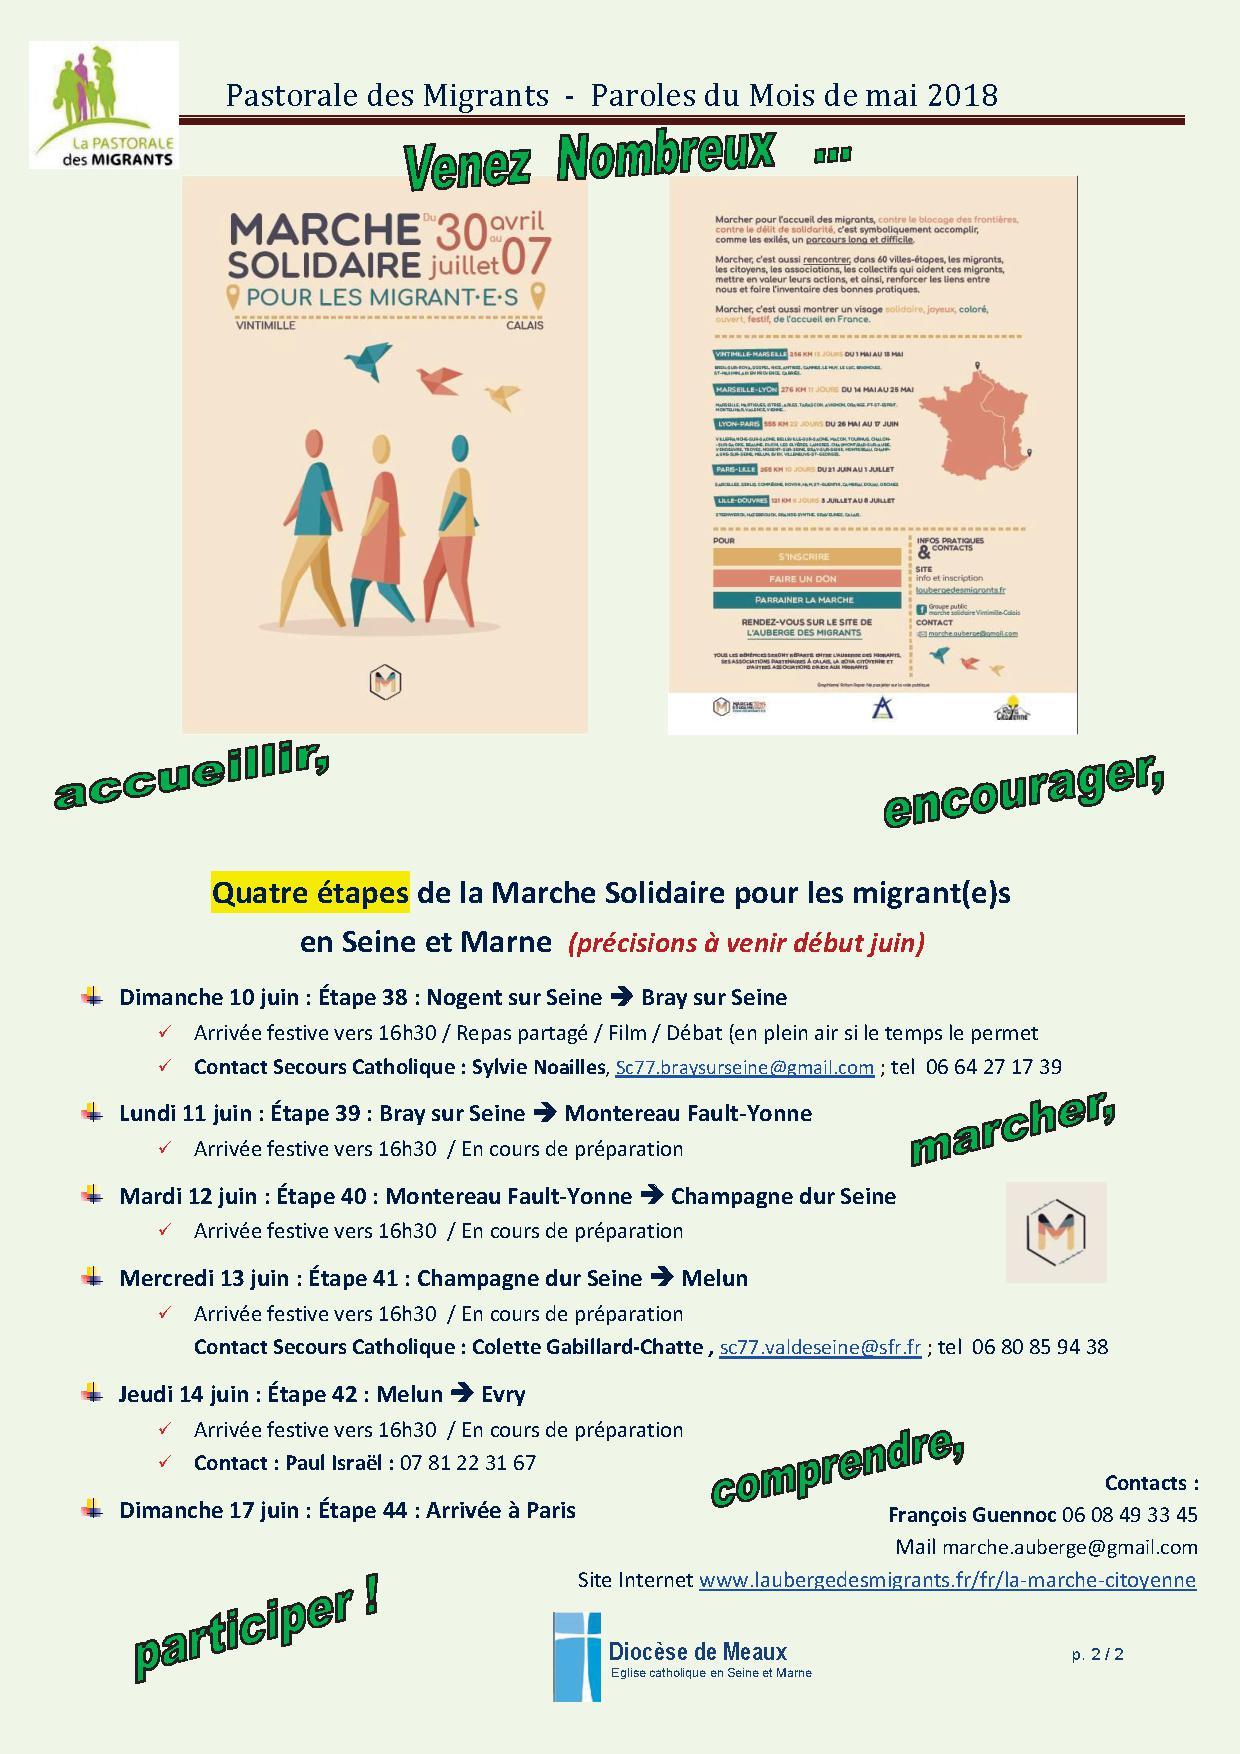 Marche Solidaire Migrants-2